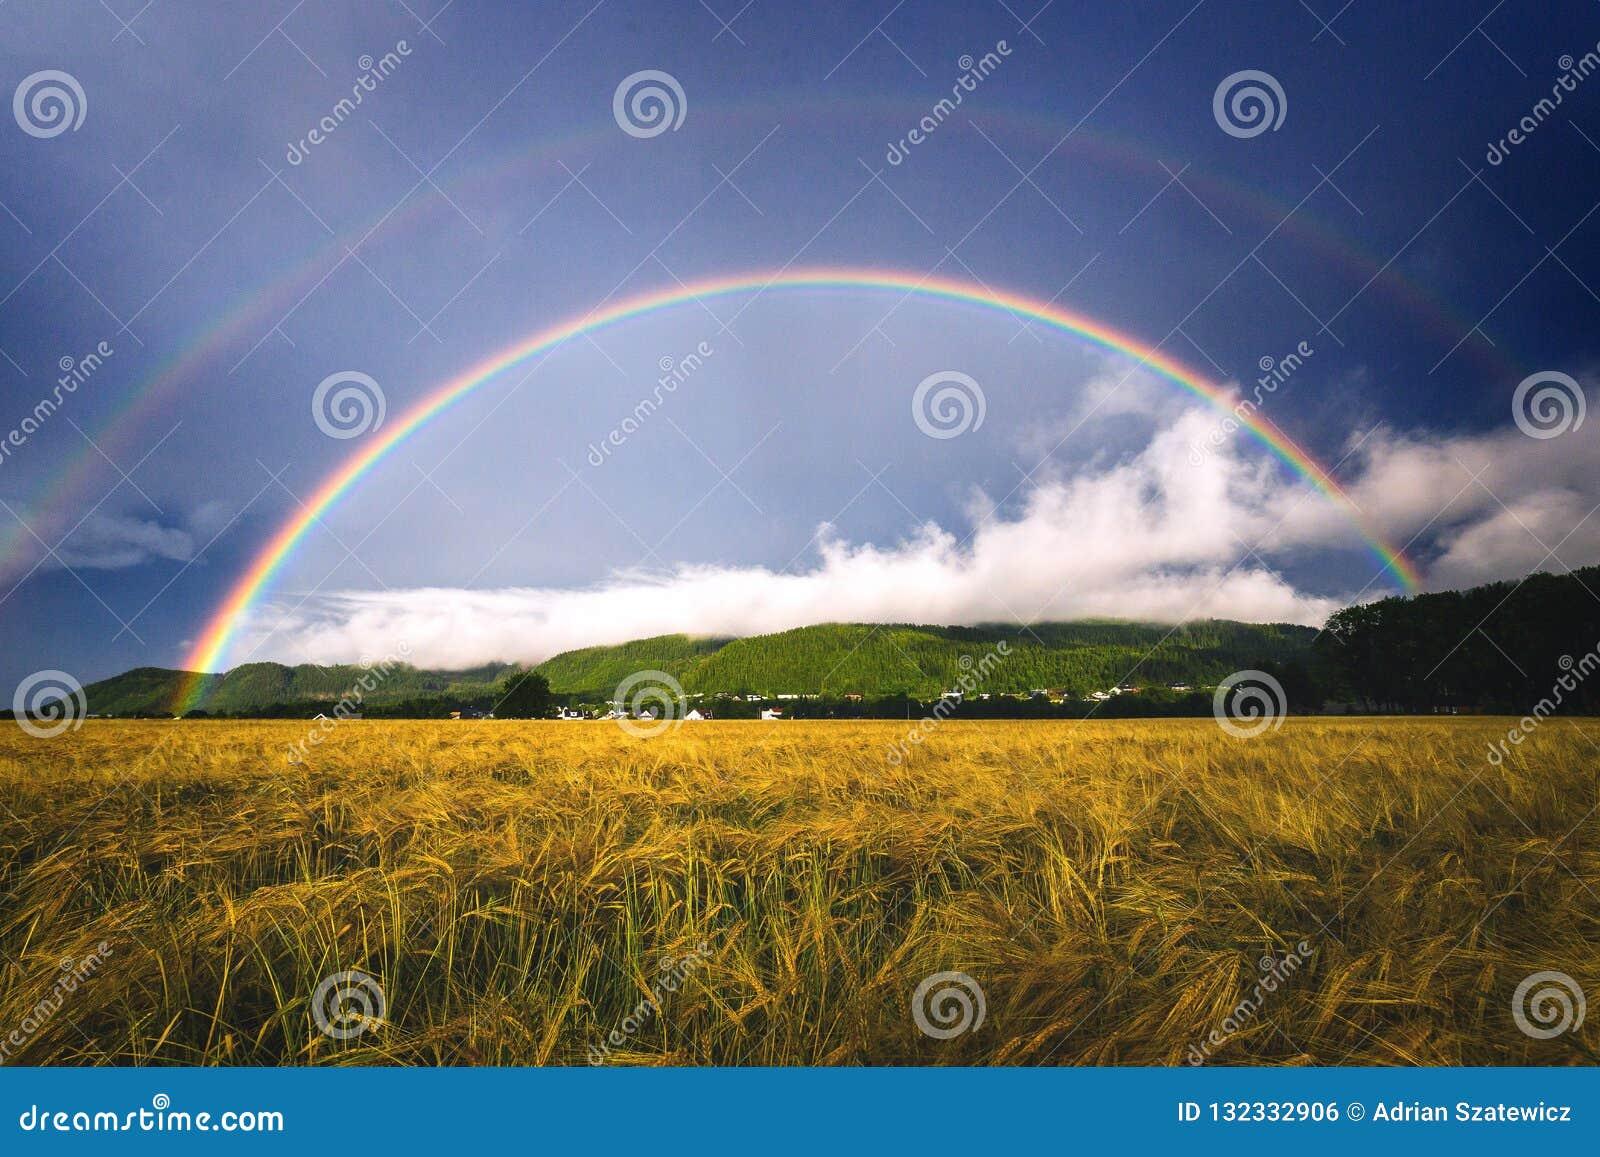 Doppio arcobaleno sopra i campi agricoli nelle zone rurali in Ranheim, Norvegia